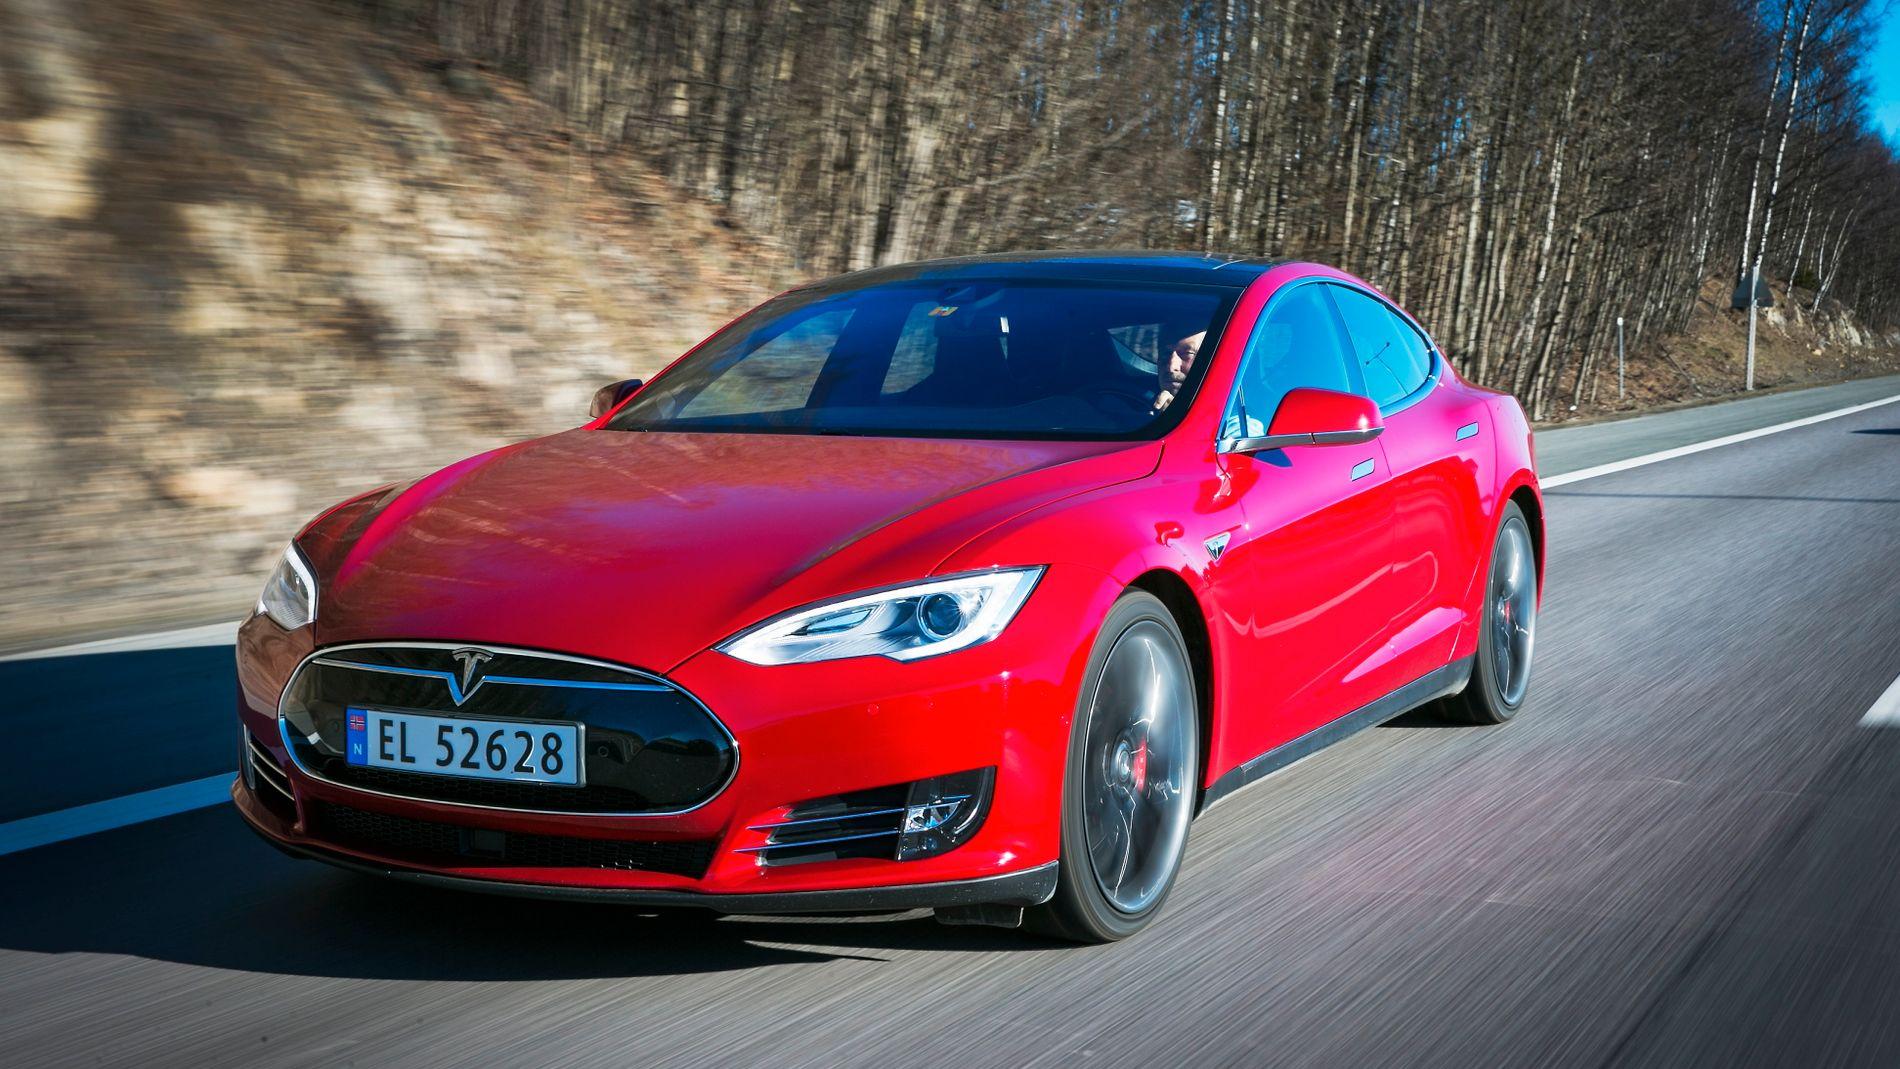 Tesla ble solgt med 700 hk – men bilen har kun 469 hk – VG